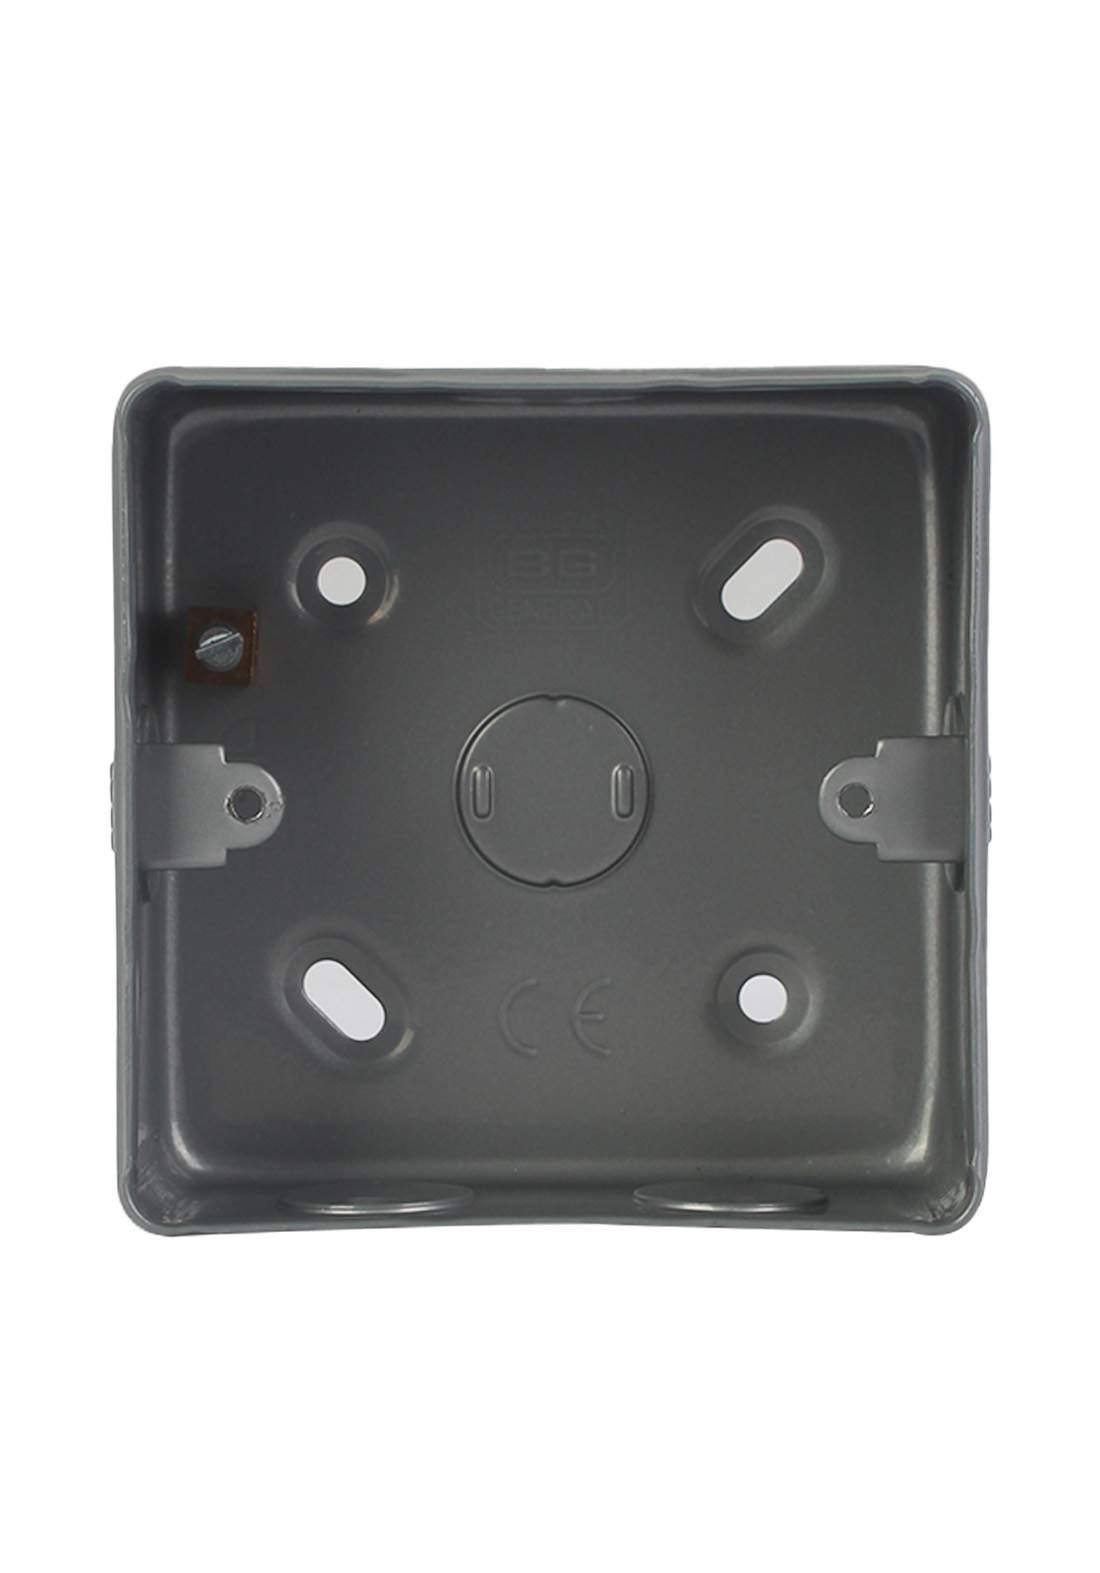 Bg MC501 Metal Box بوكس معدني